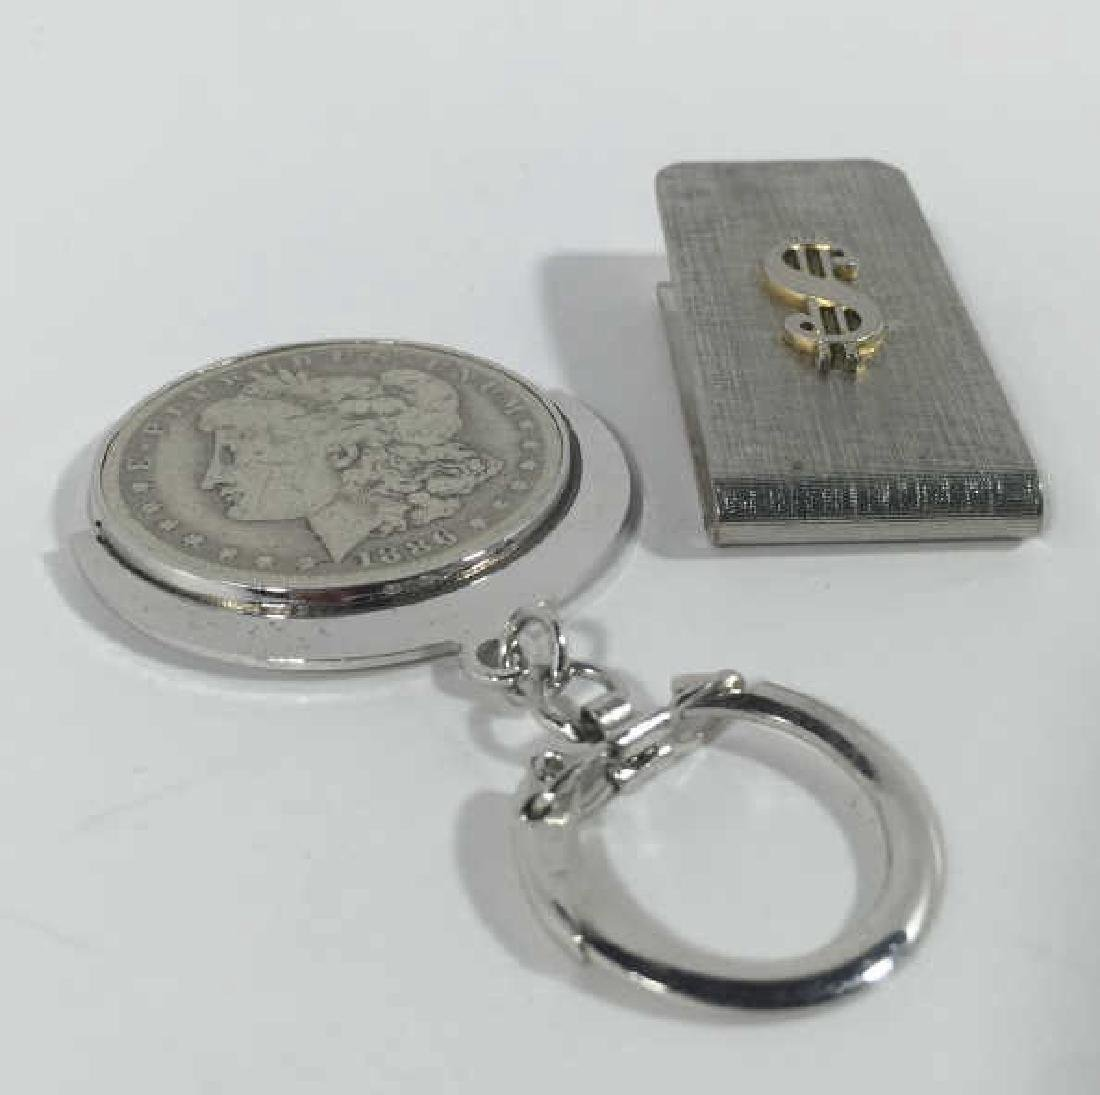 Antique 1886 US Dollar Key Chain & Money Clip